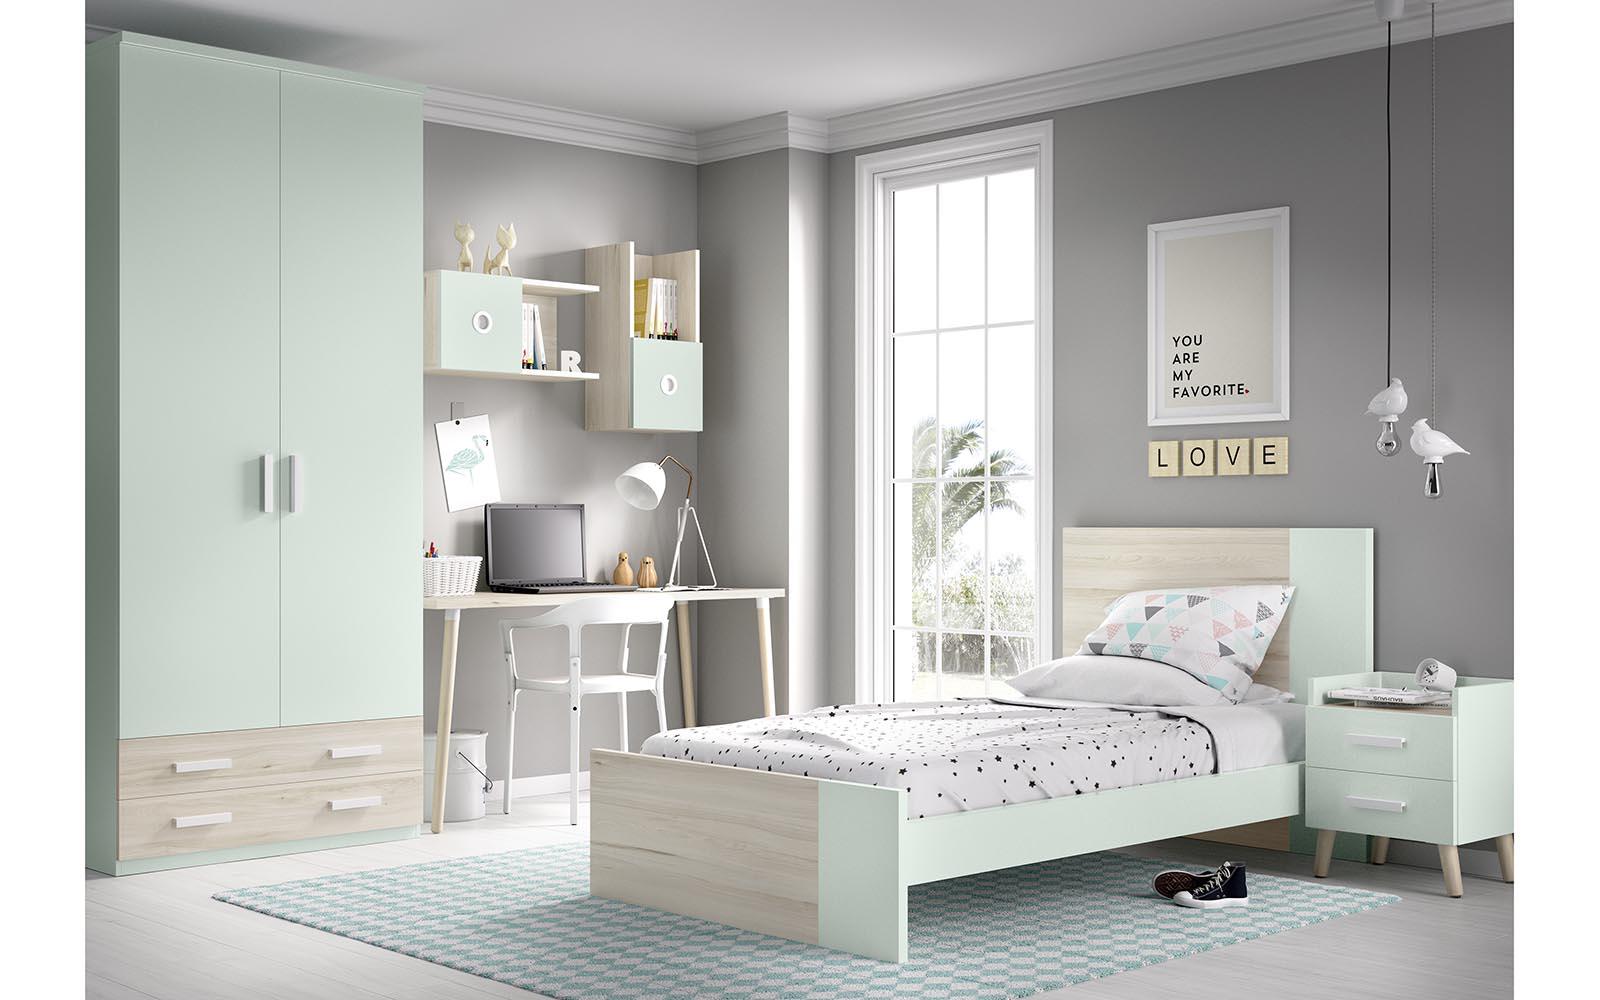 wooden light green single kids bed with high headboard and front, psili kefalaria paidiko krevati anoixto prasino kai xilo,